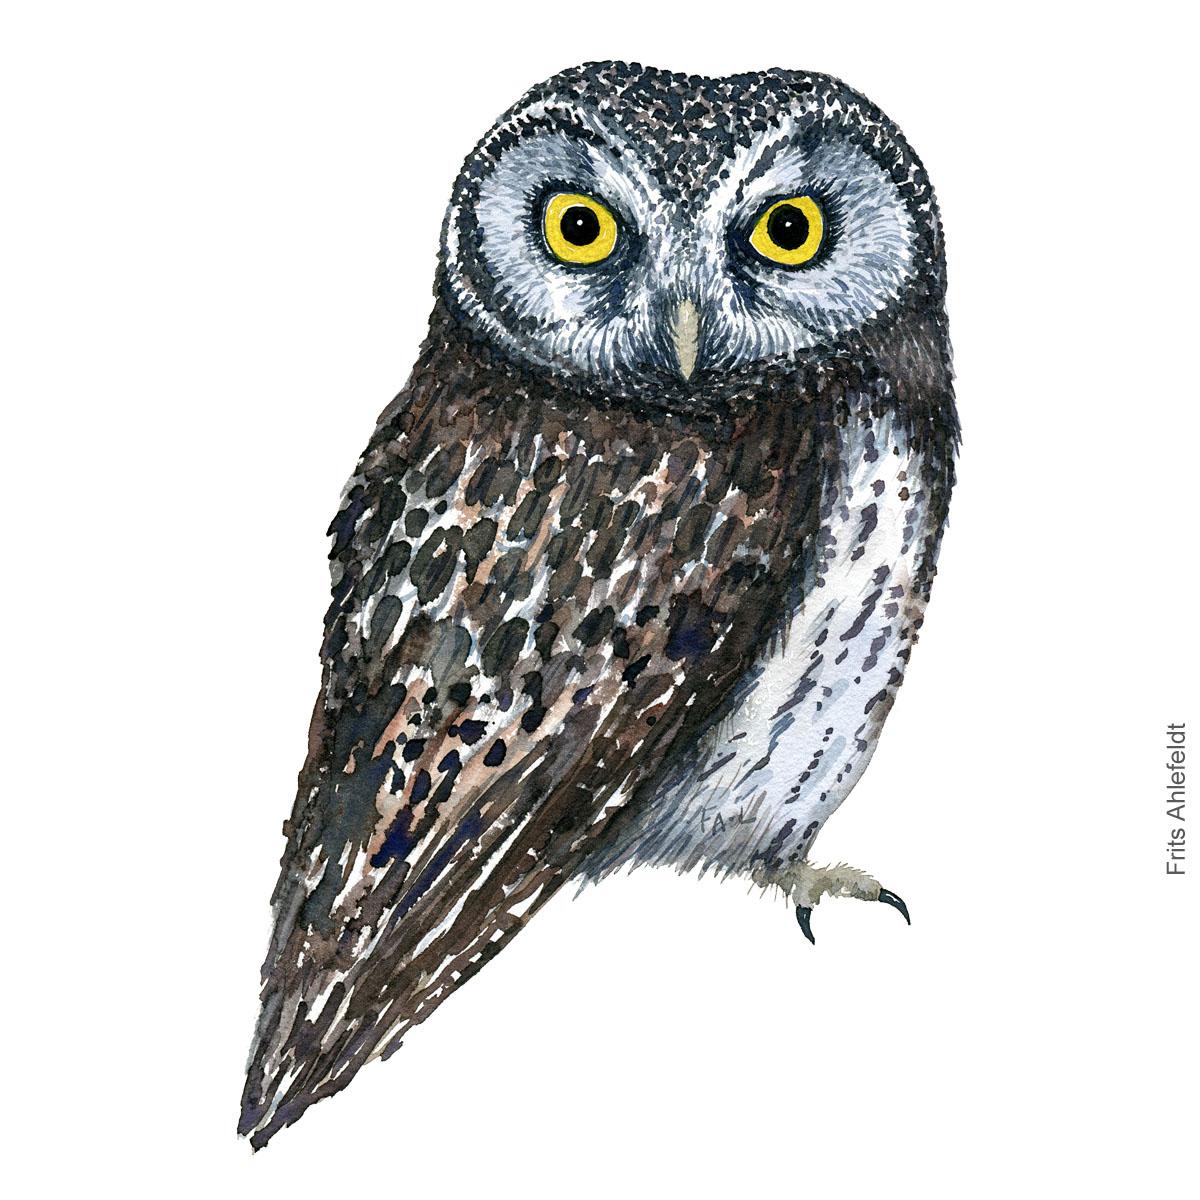 Boreal owl - Perleugle Akvarel. Watercolor bird illustration by Frits Ahlefeldt